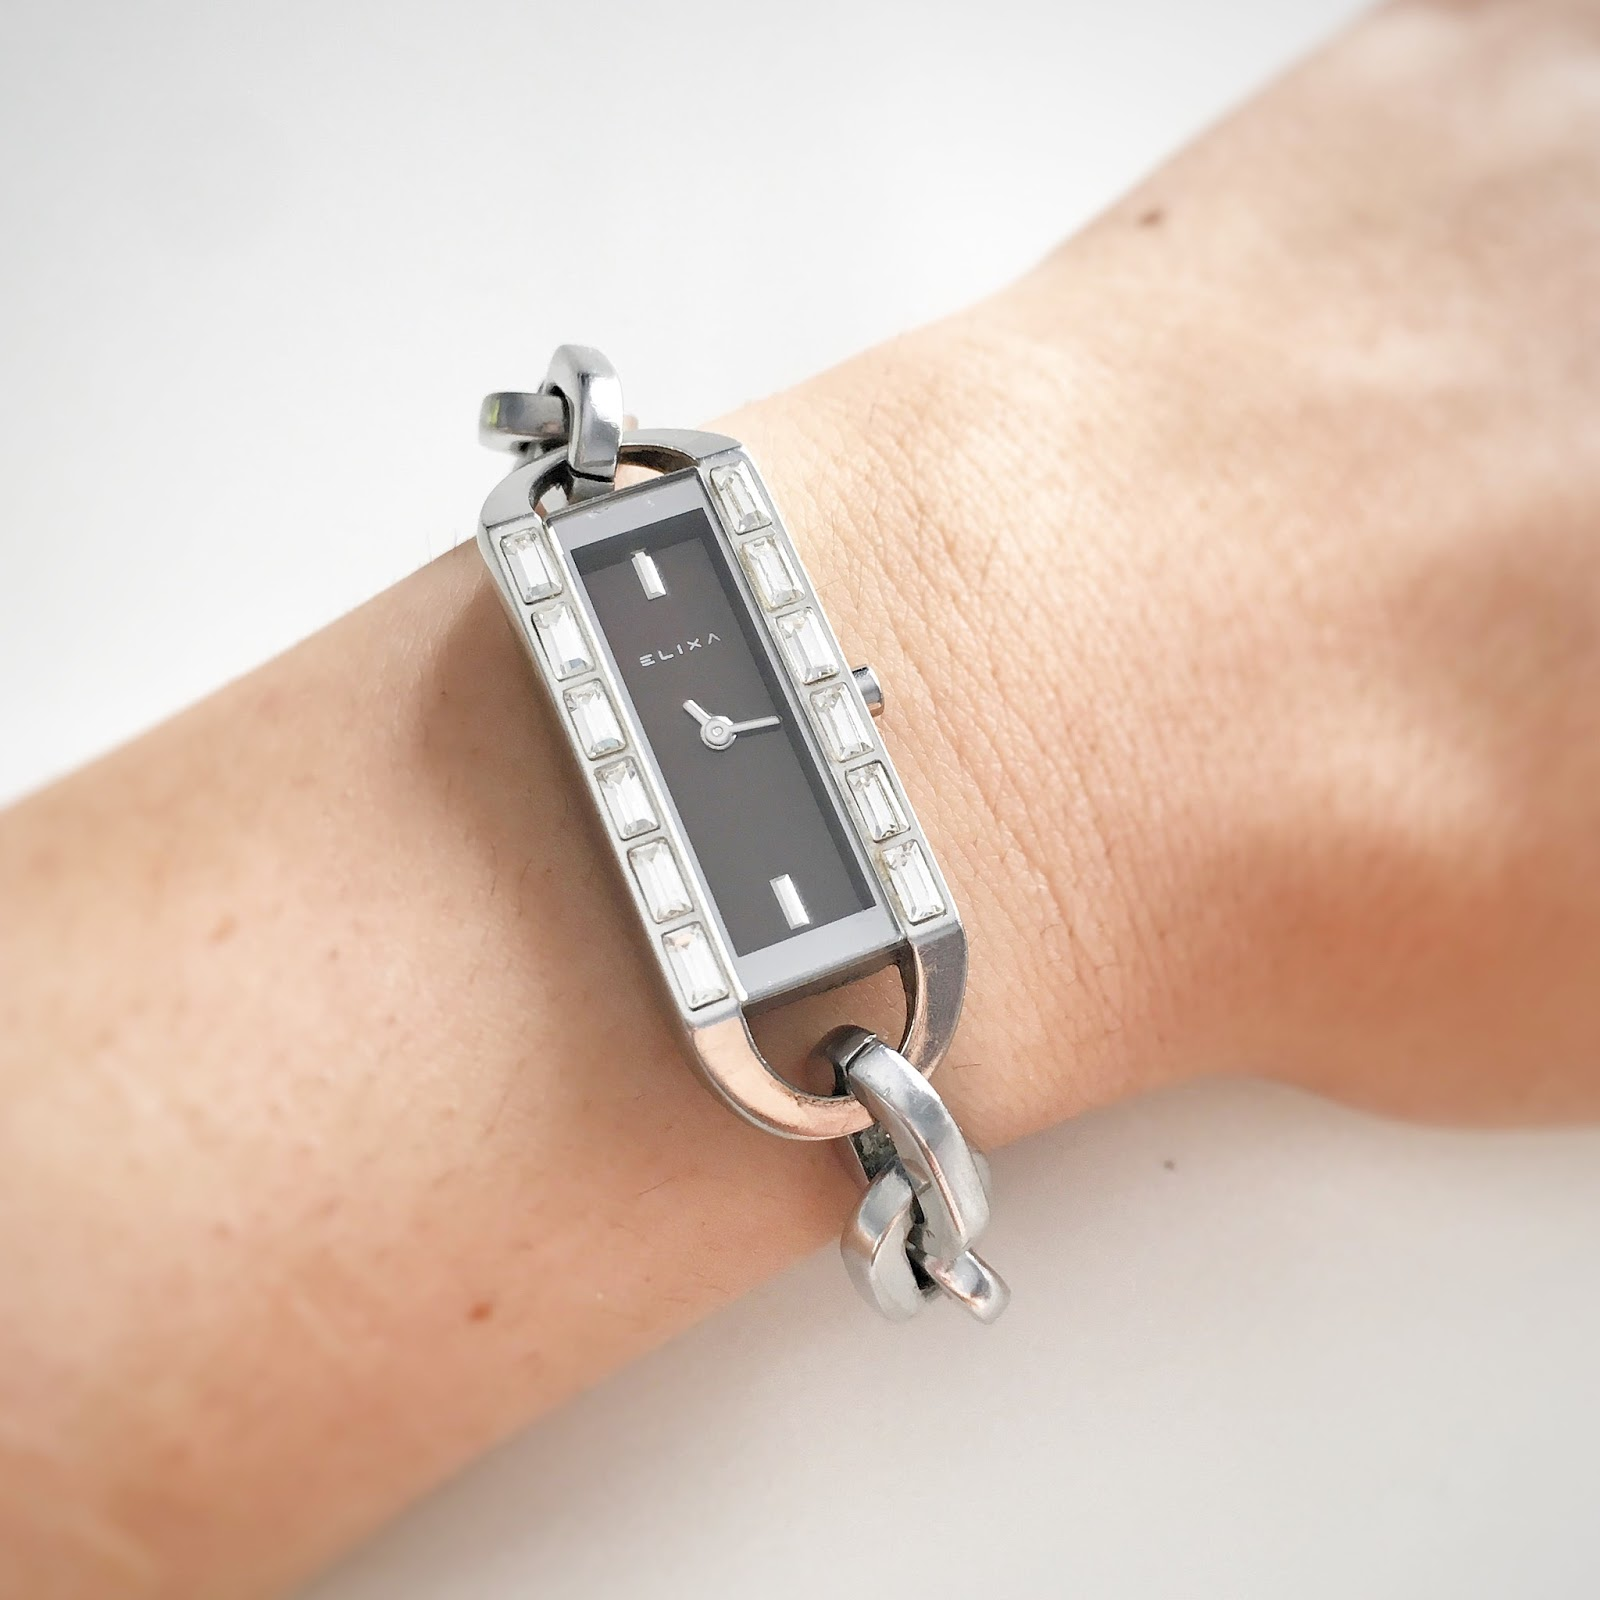 zegarek-stalowy-elixa-Apart-opinie-blog